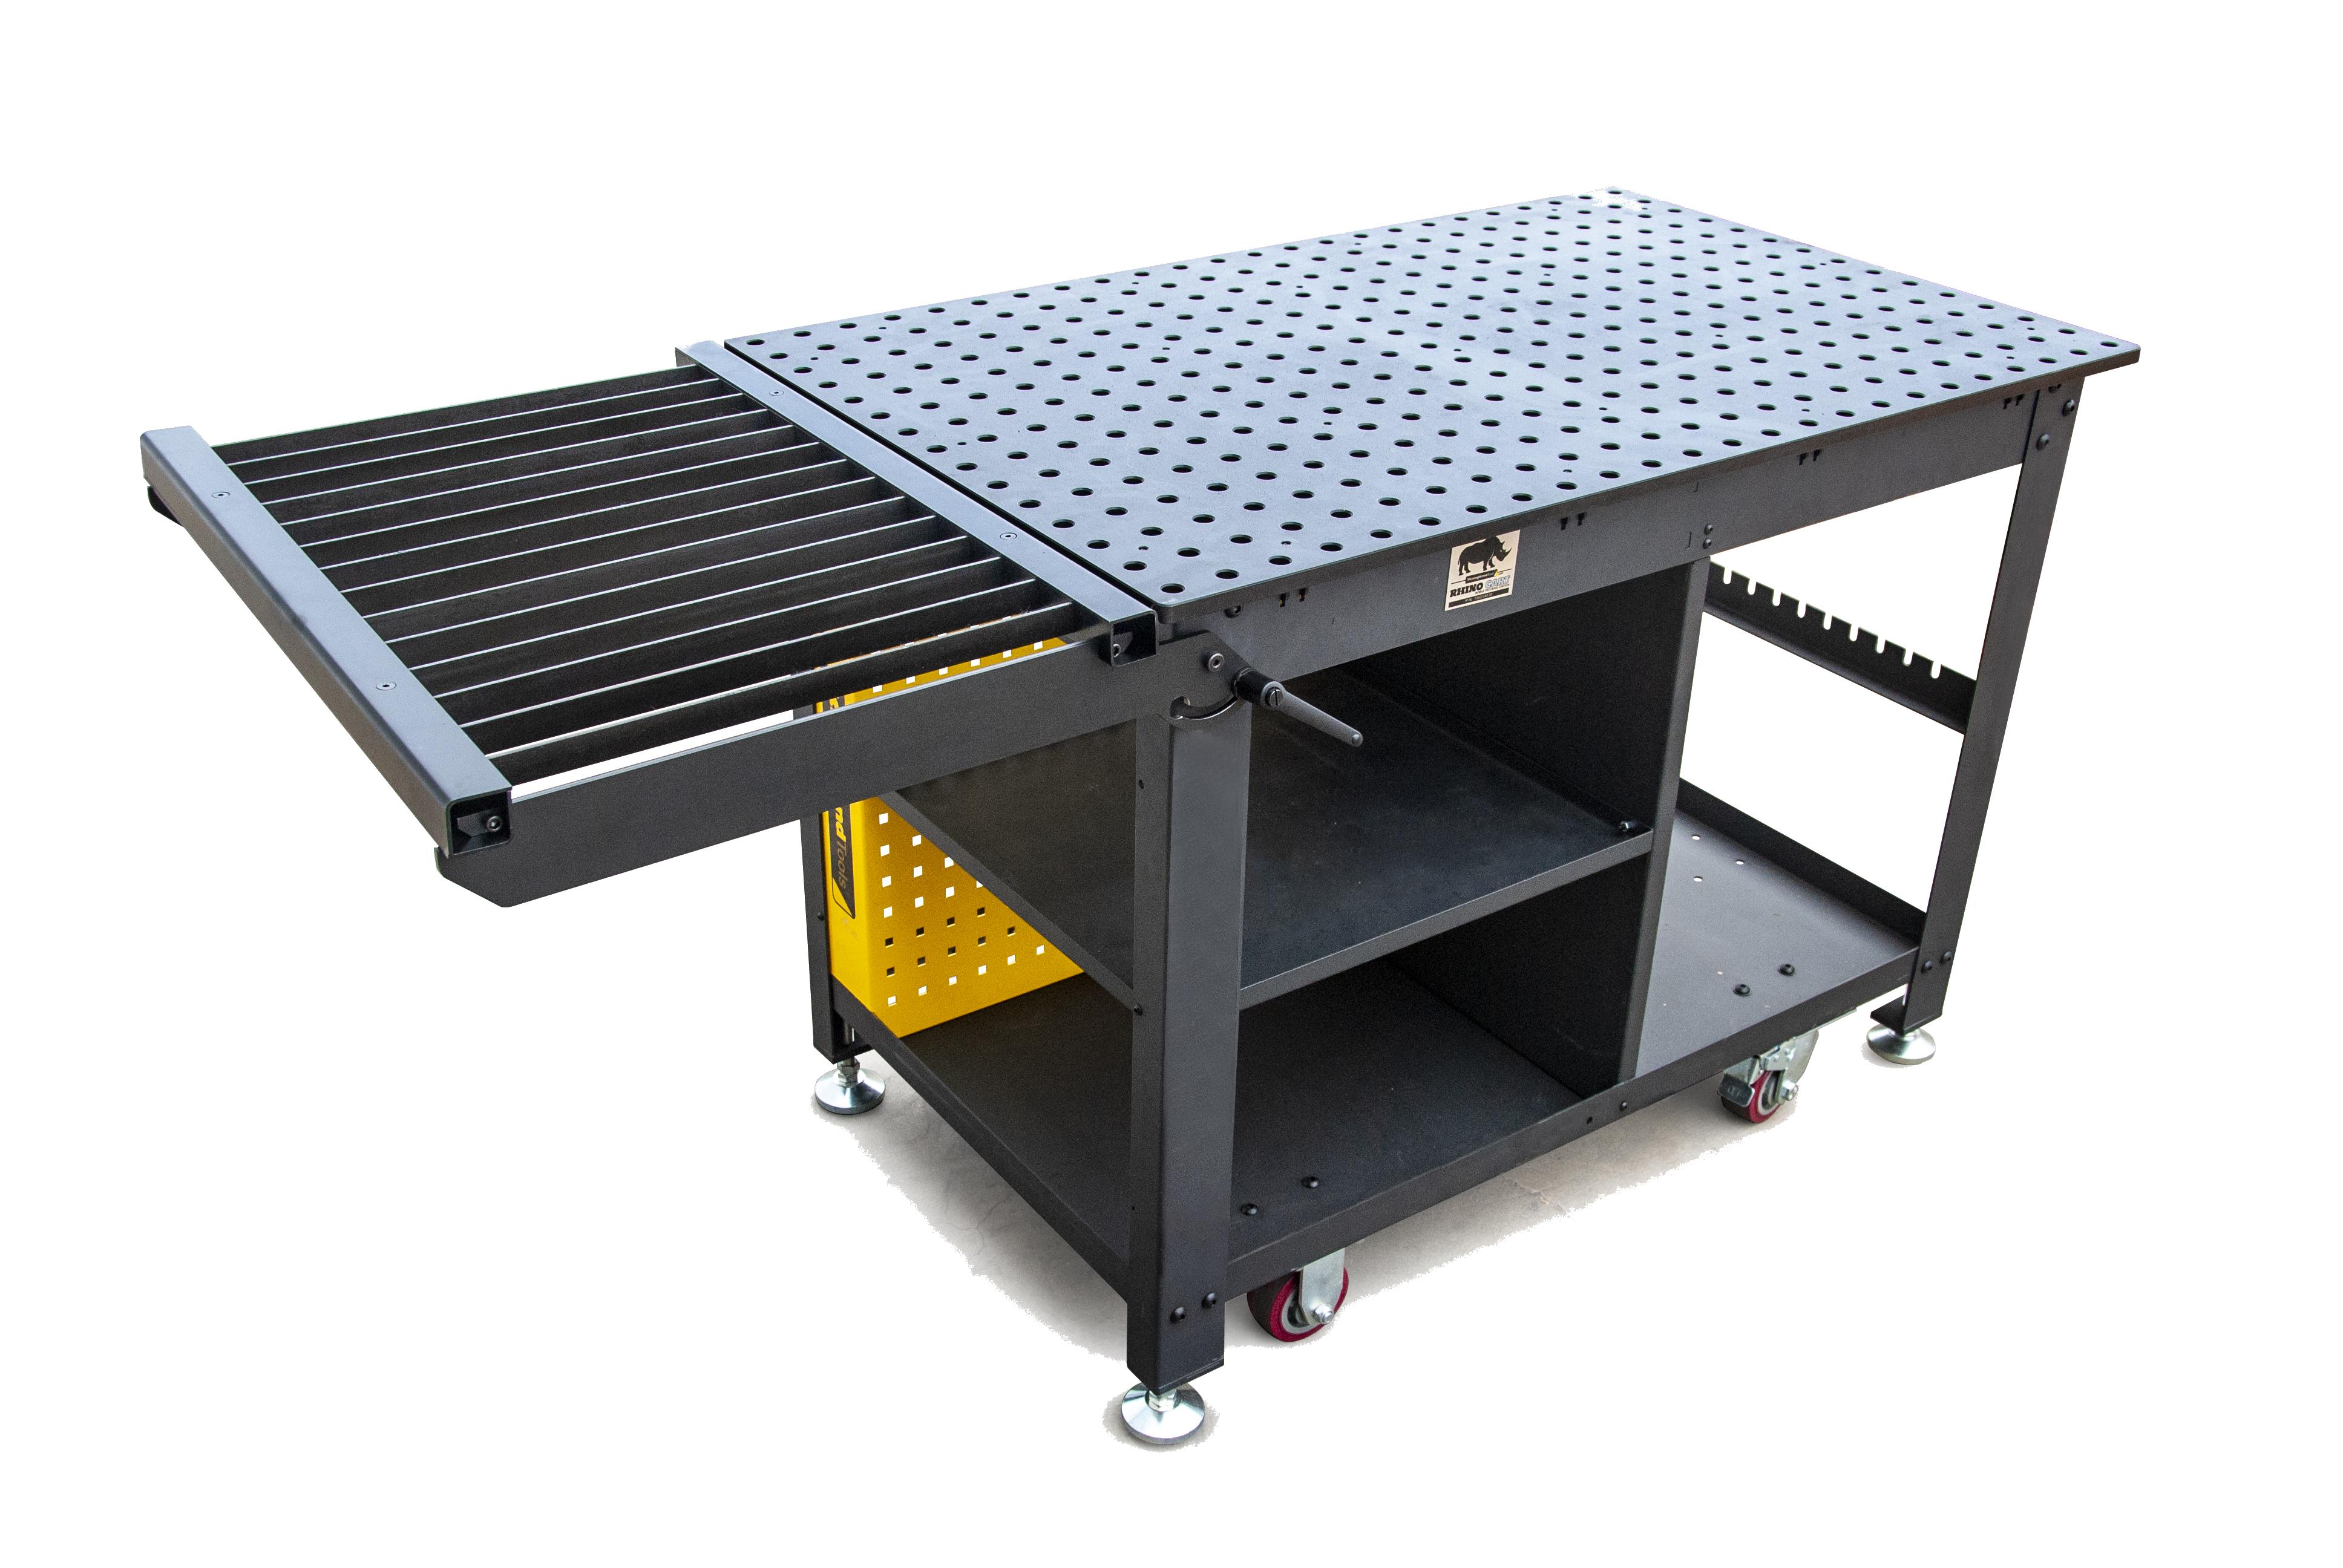 table facon etabli rhino cart avec plateau decoupe plasma